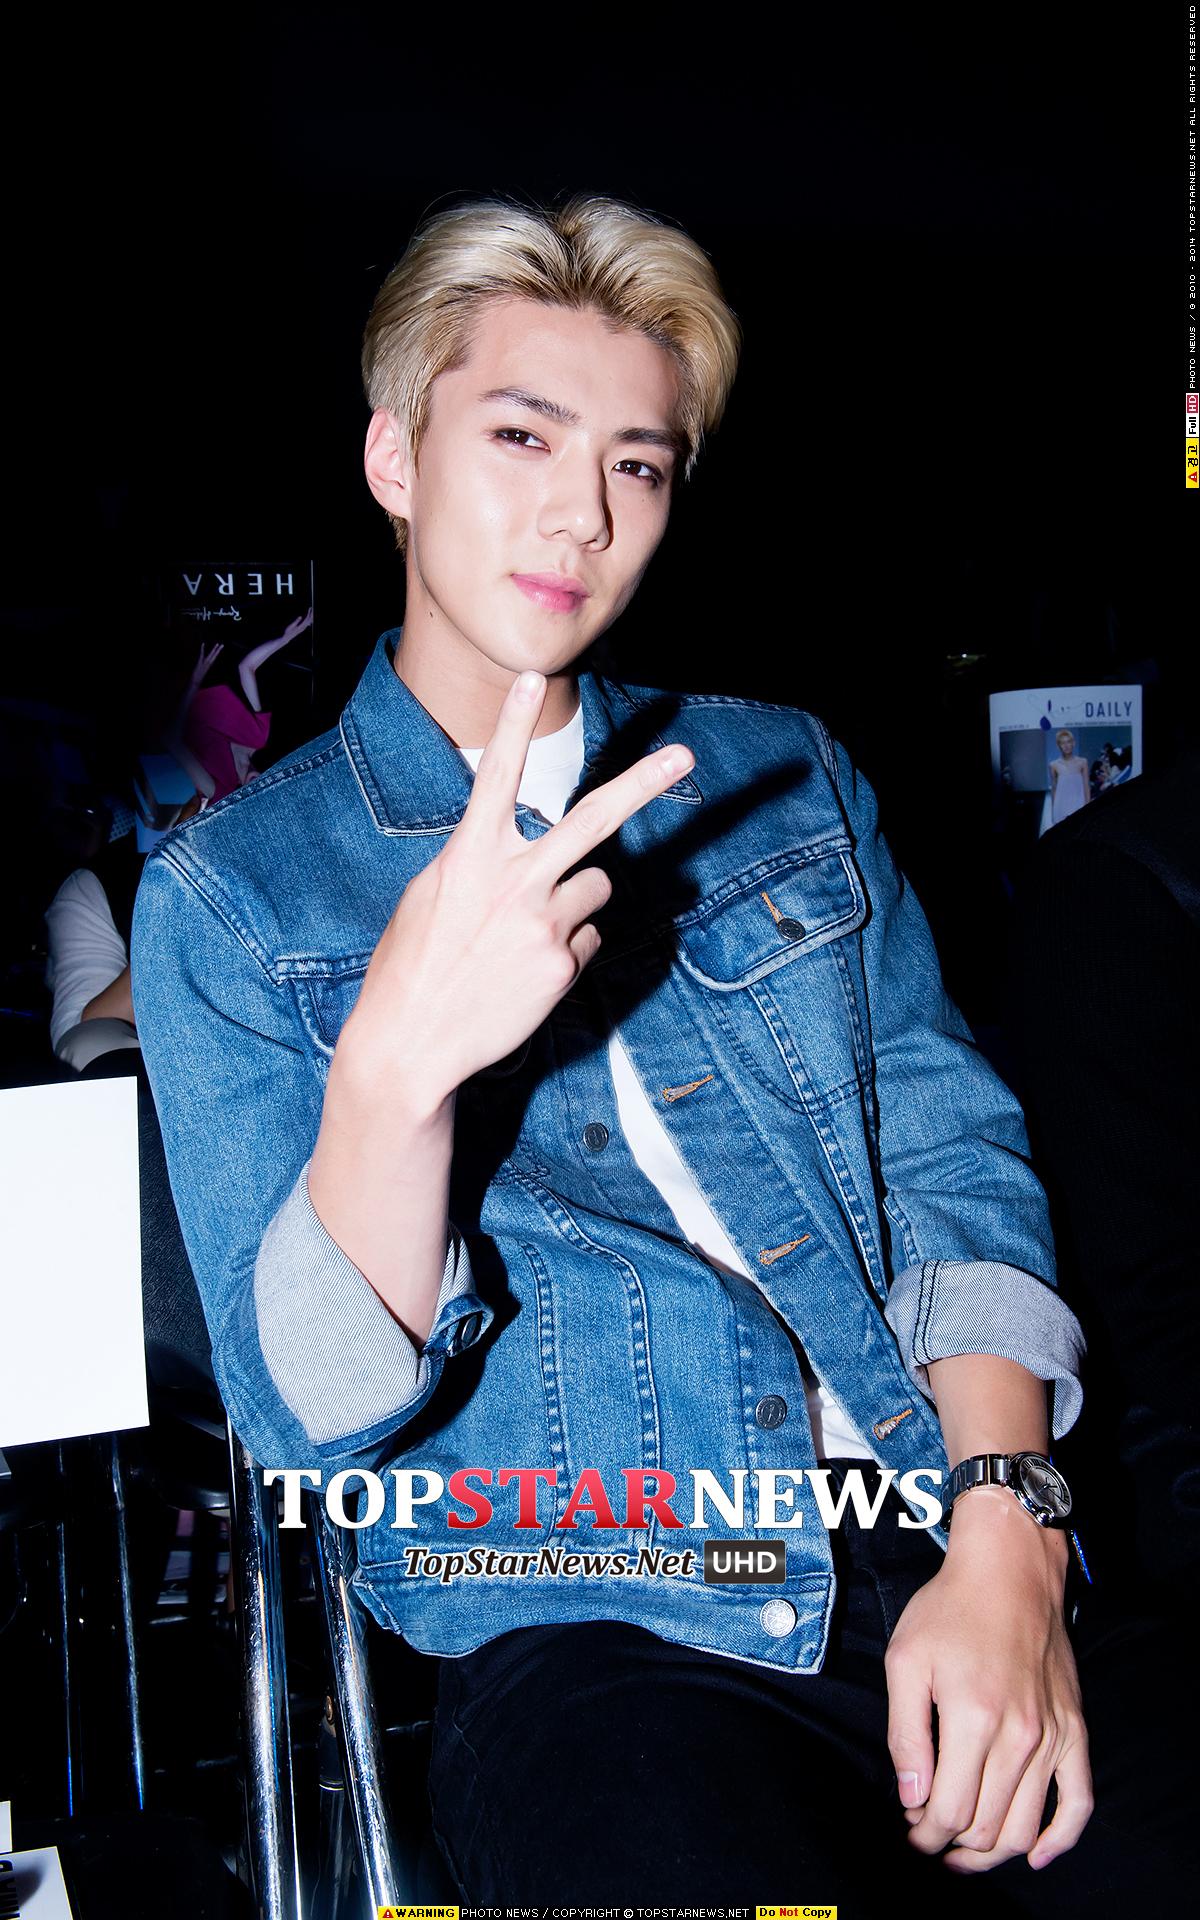 ♥ V 臉男孩 3 號:EXO 世勳  說到下巴美男怎麼能少掉他呢?沒錯!就是 EXO 的老么「世勳」,因為下巴線條很明顯,讓整張臉看起來更小更精緻了!